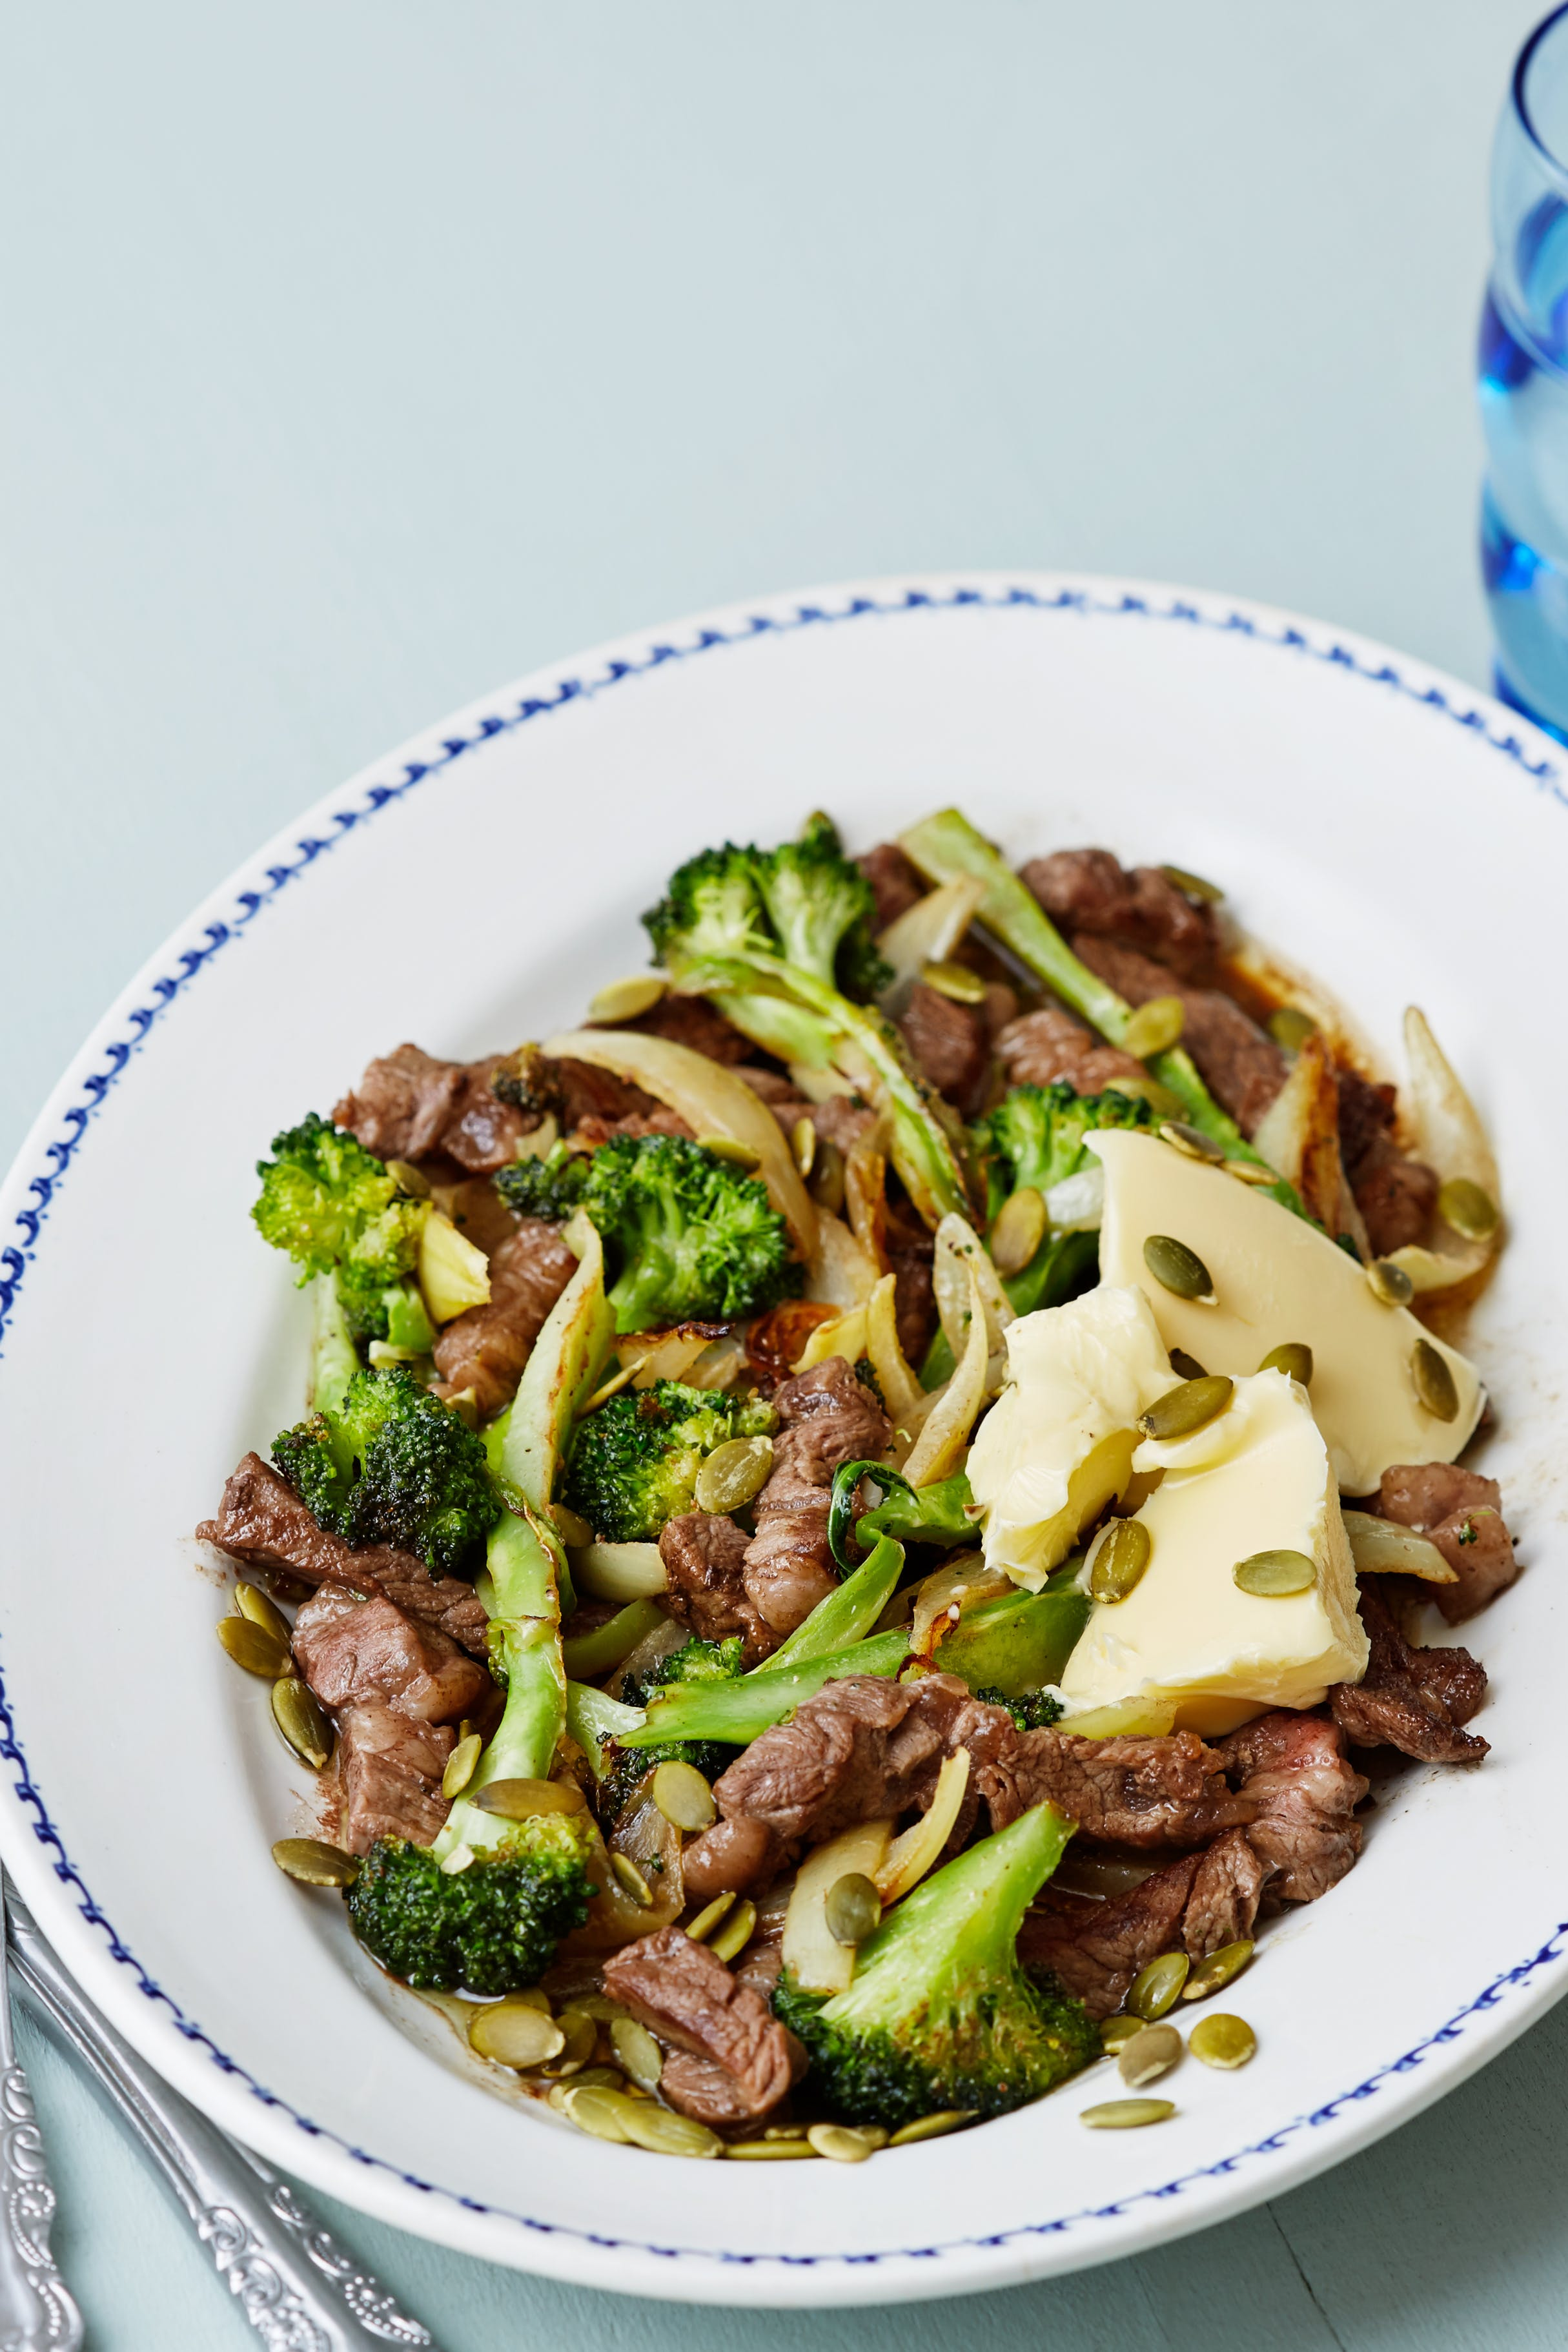 Keto steak and broccoli stir-fry